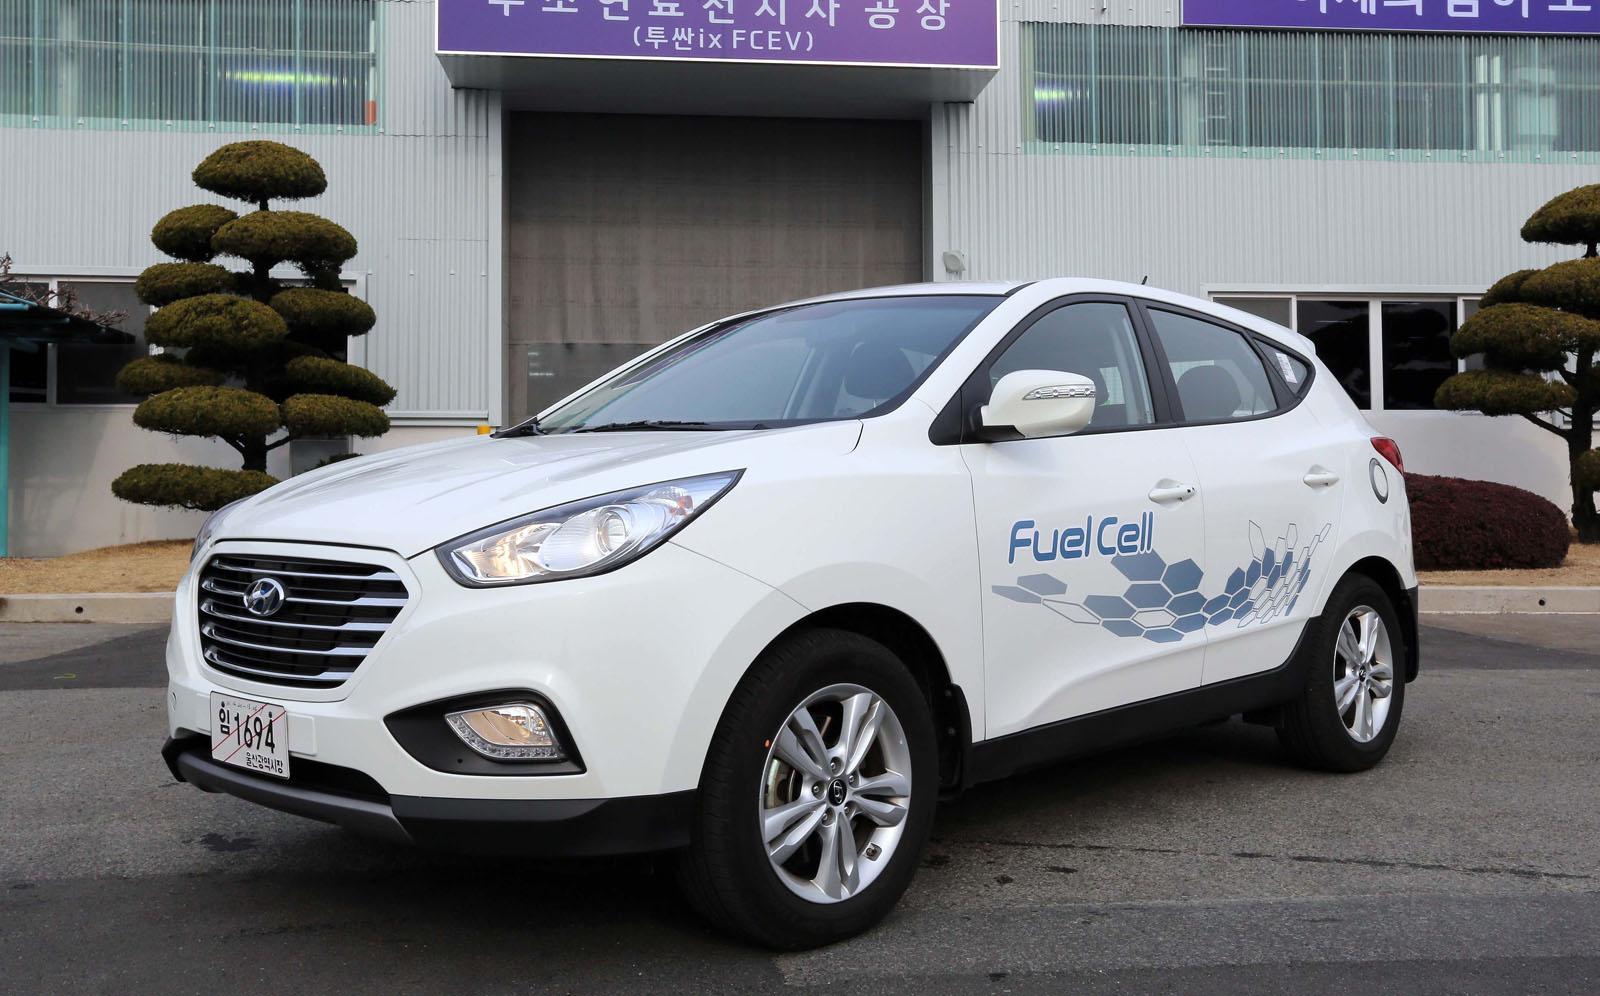 hyundai ix35 fuel cell vehicle enters production autoevolution. Black Bedroom Furniture Sets. Home Design Ideas